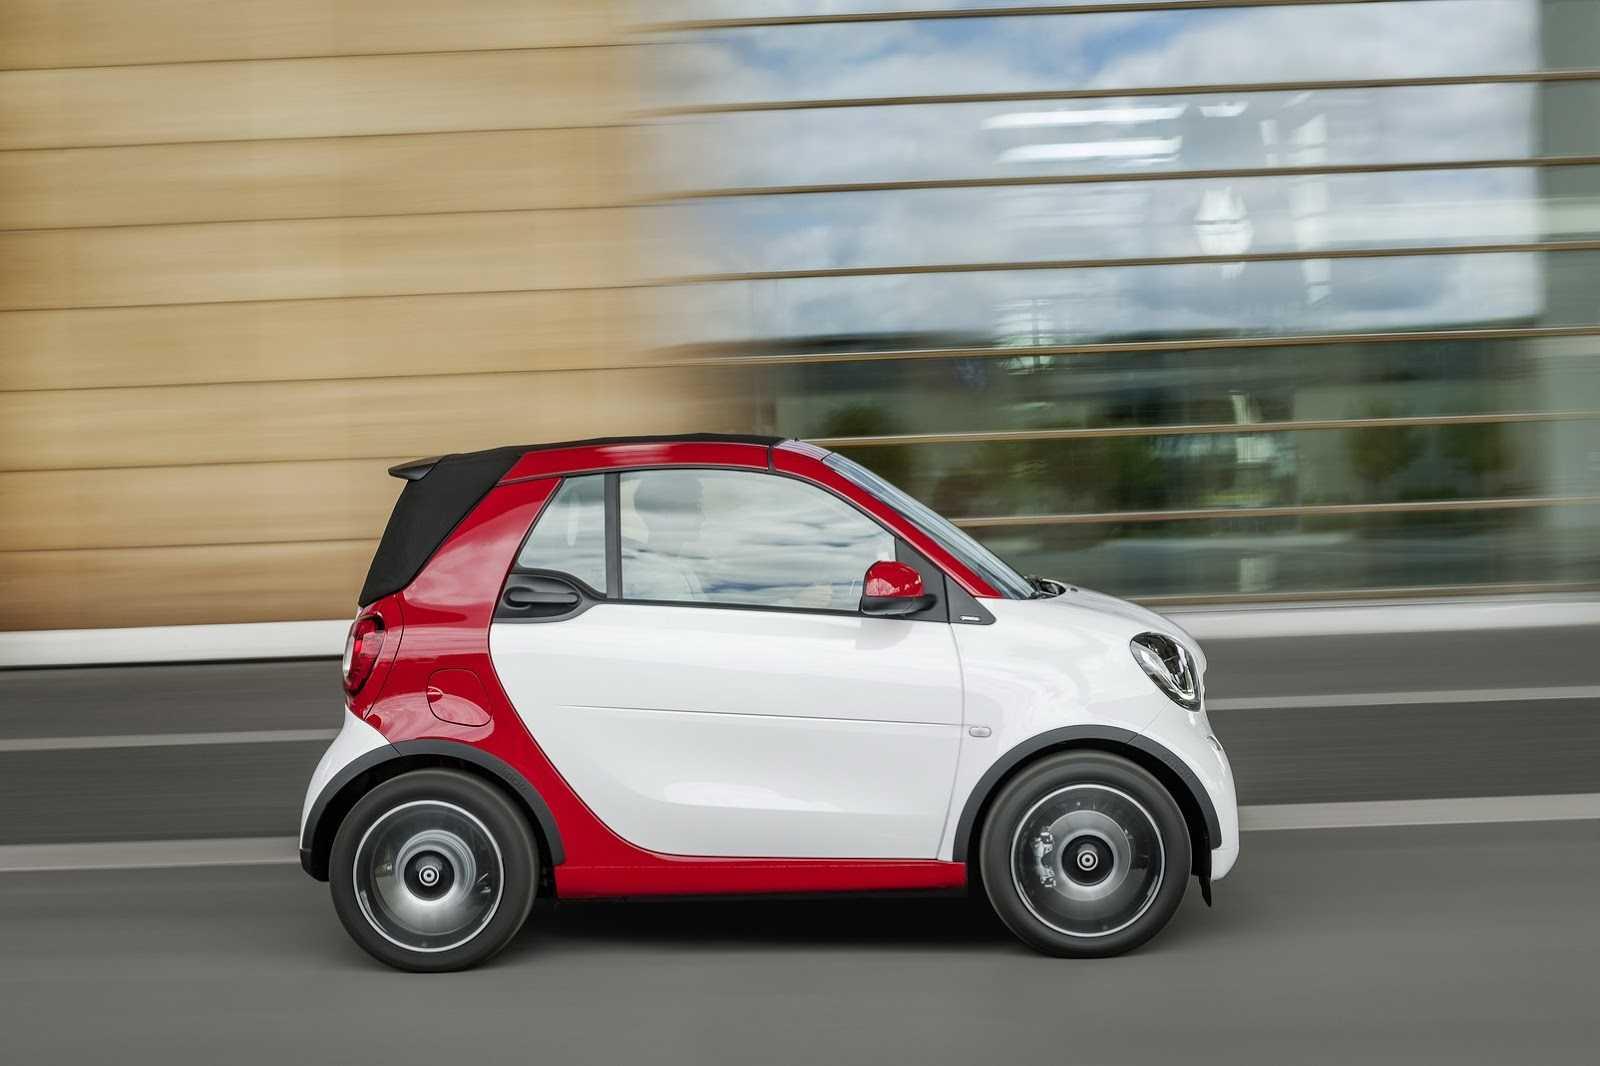 Smart fortwo cabrio привезут во франкфурт - «автоновости»